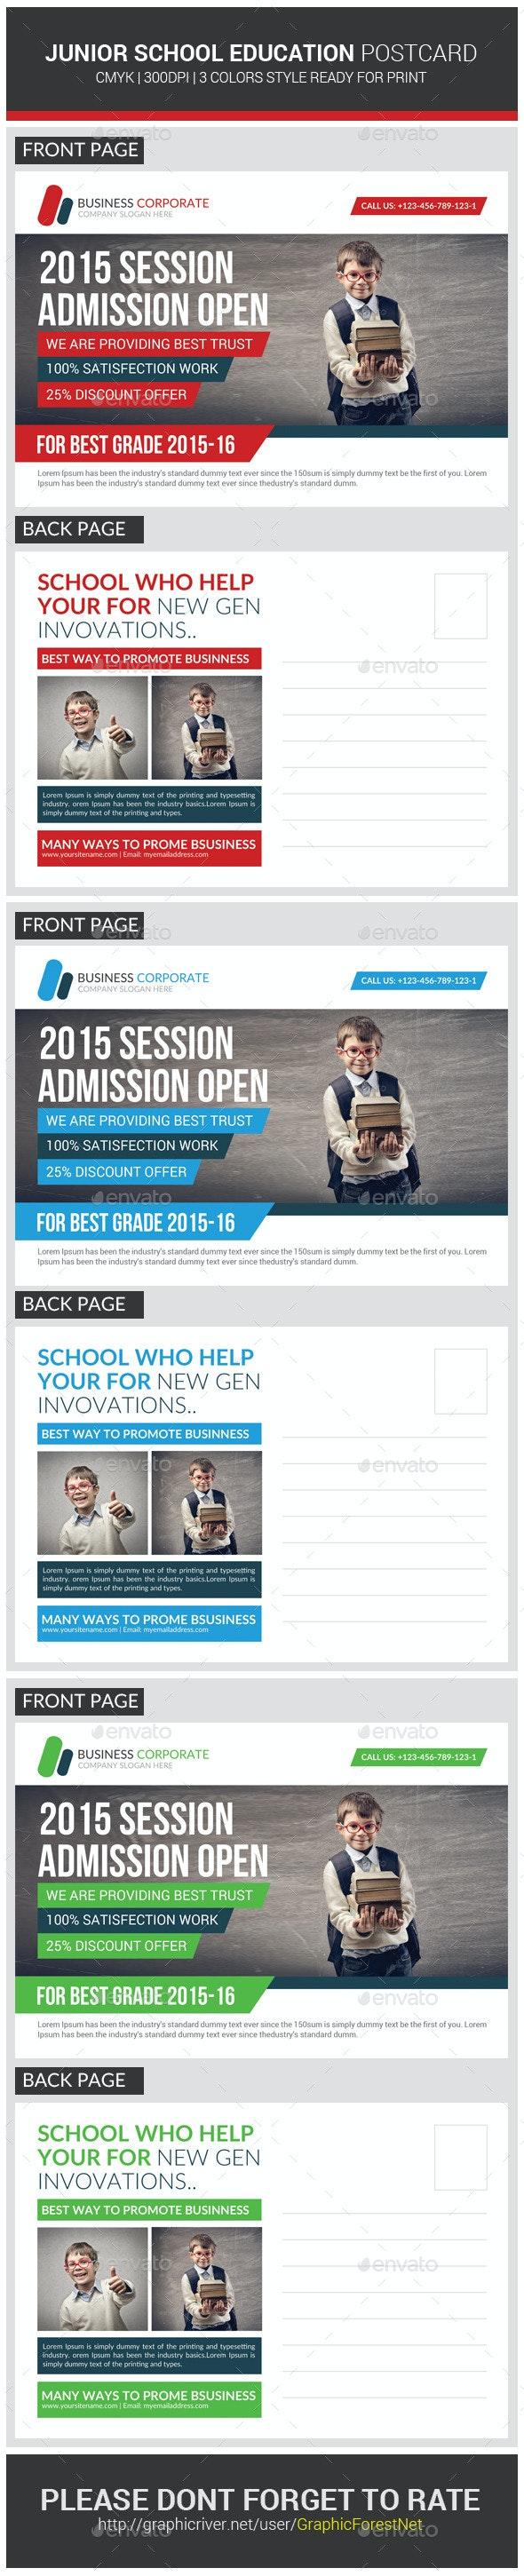 Junior School Promotion Postcard Template - Cards & Invites Print Templates